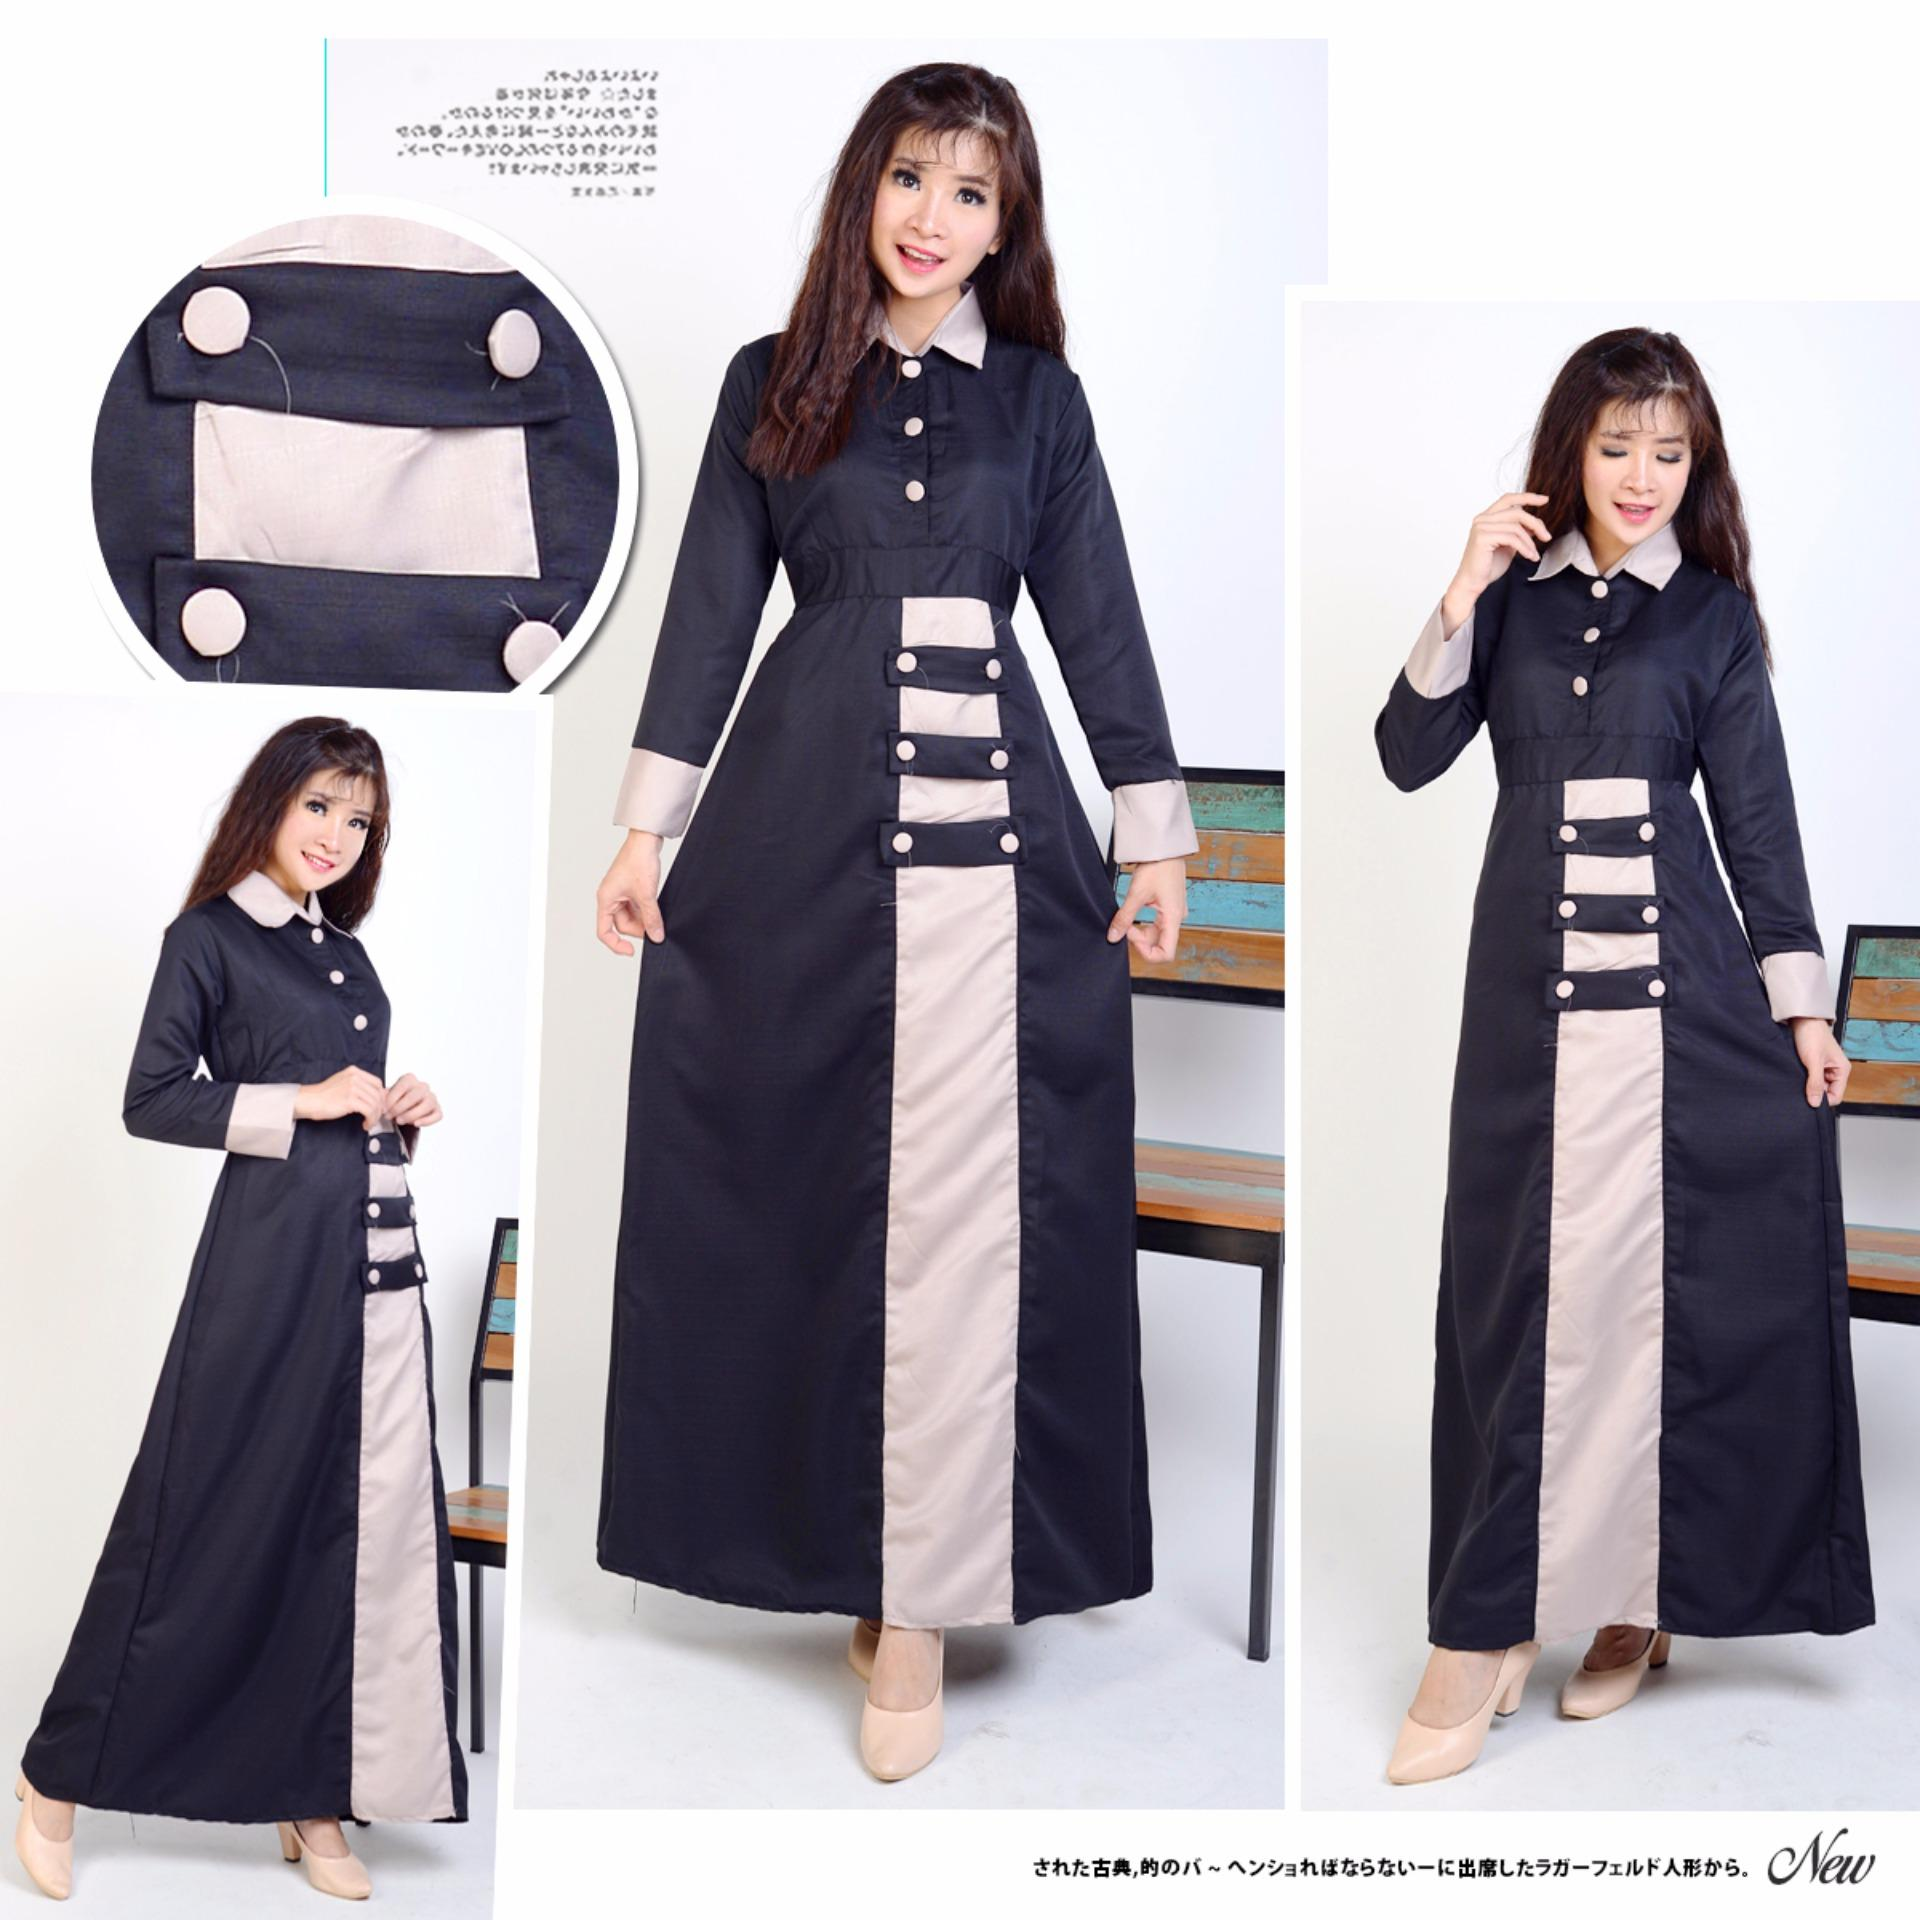 AK 372 Karina Syarii Black bergo Akiko fashion. Beli Baju Muslim Syarii OnlineStoreIn Cloud Source